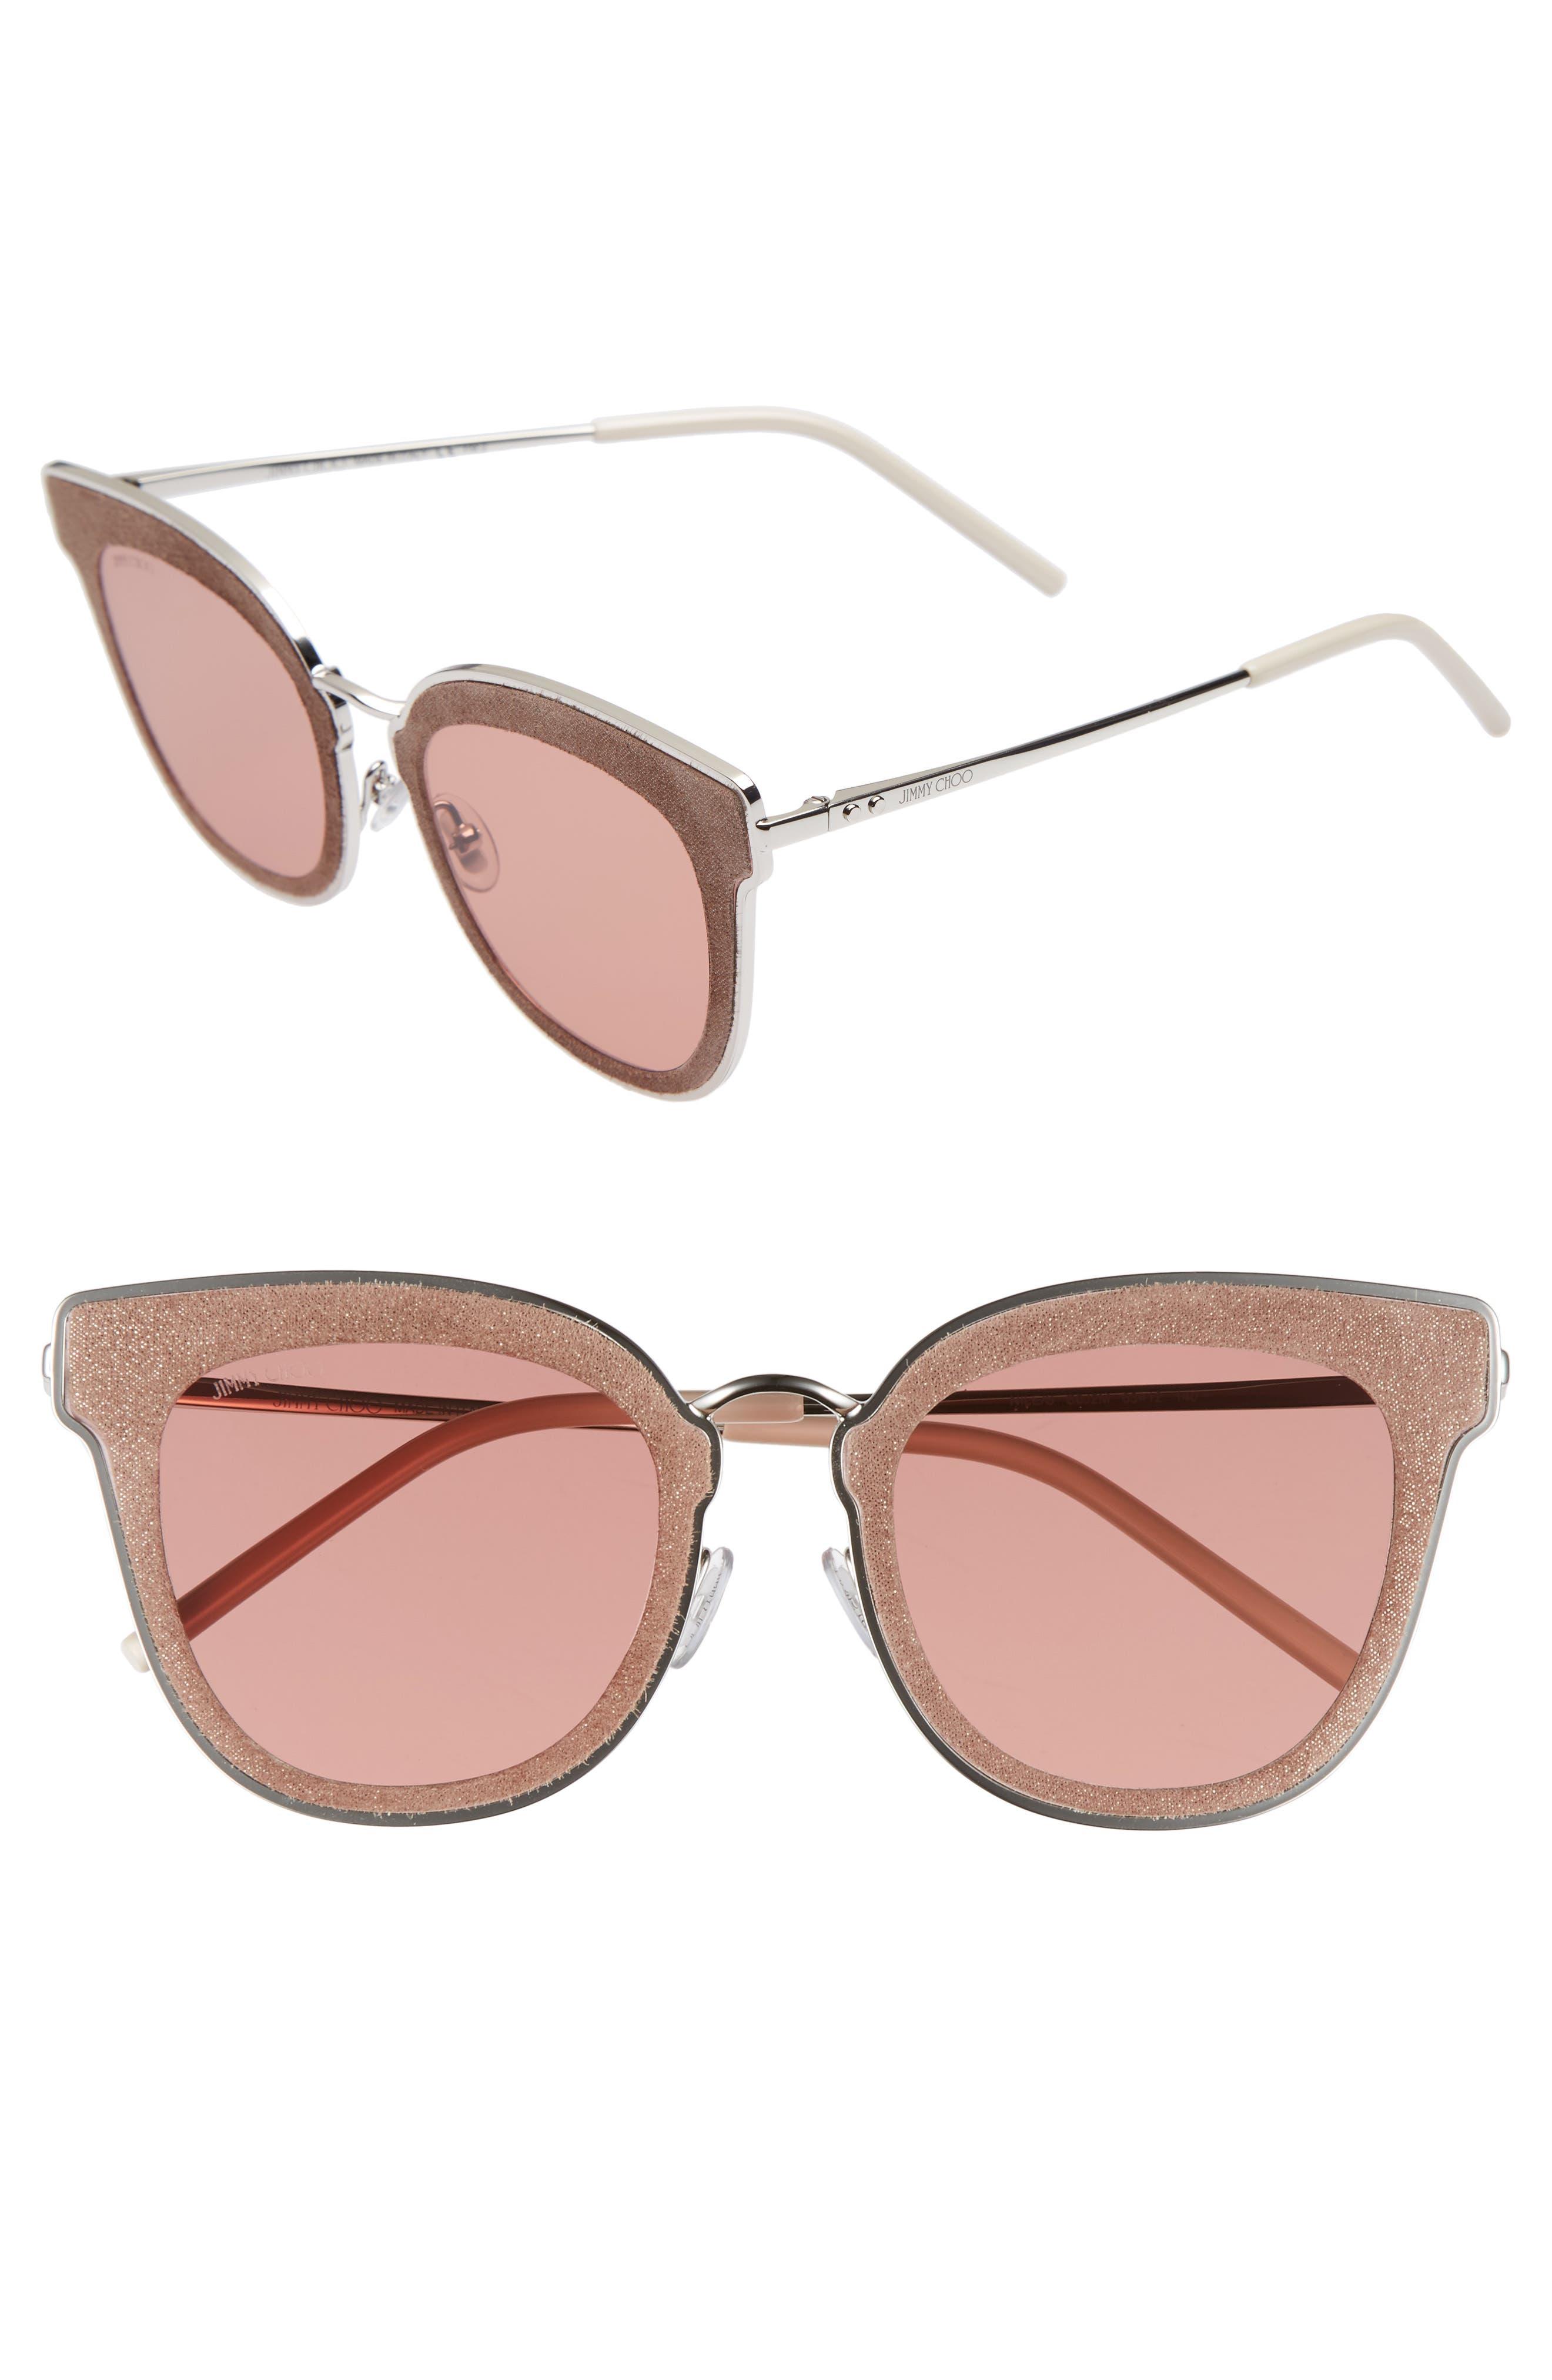 2e34279807ce3 Jimmy Choo Sunglasses for Women